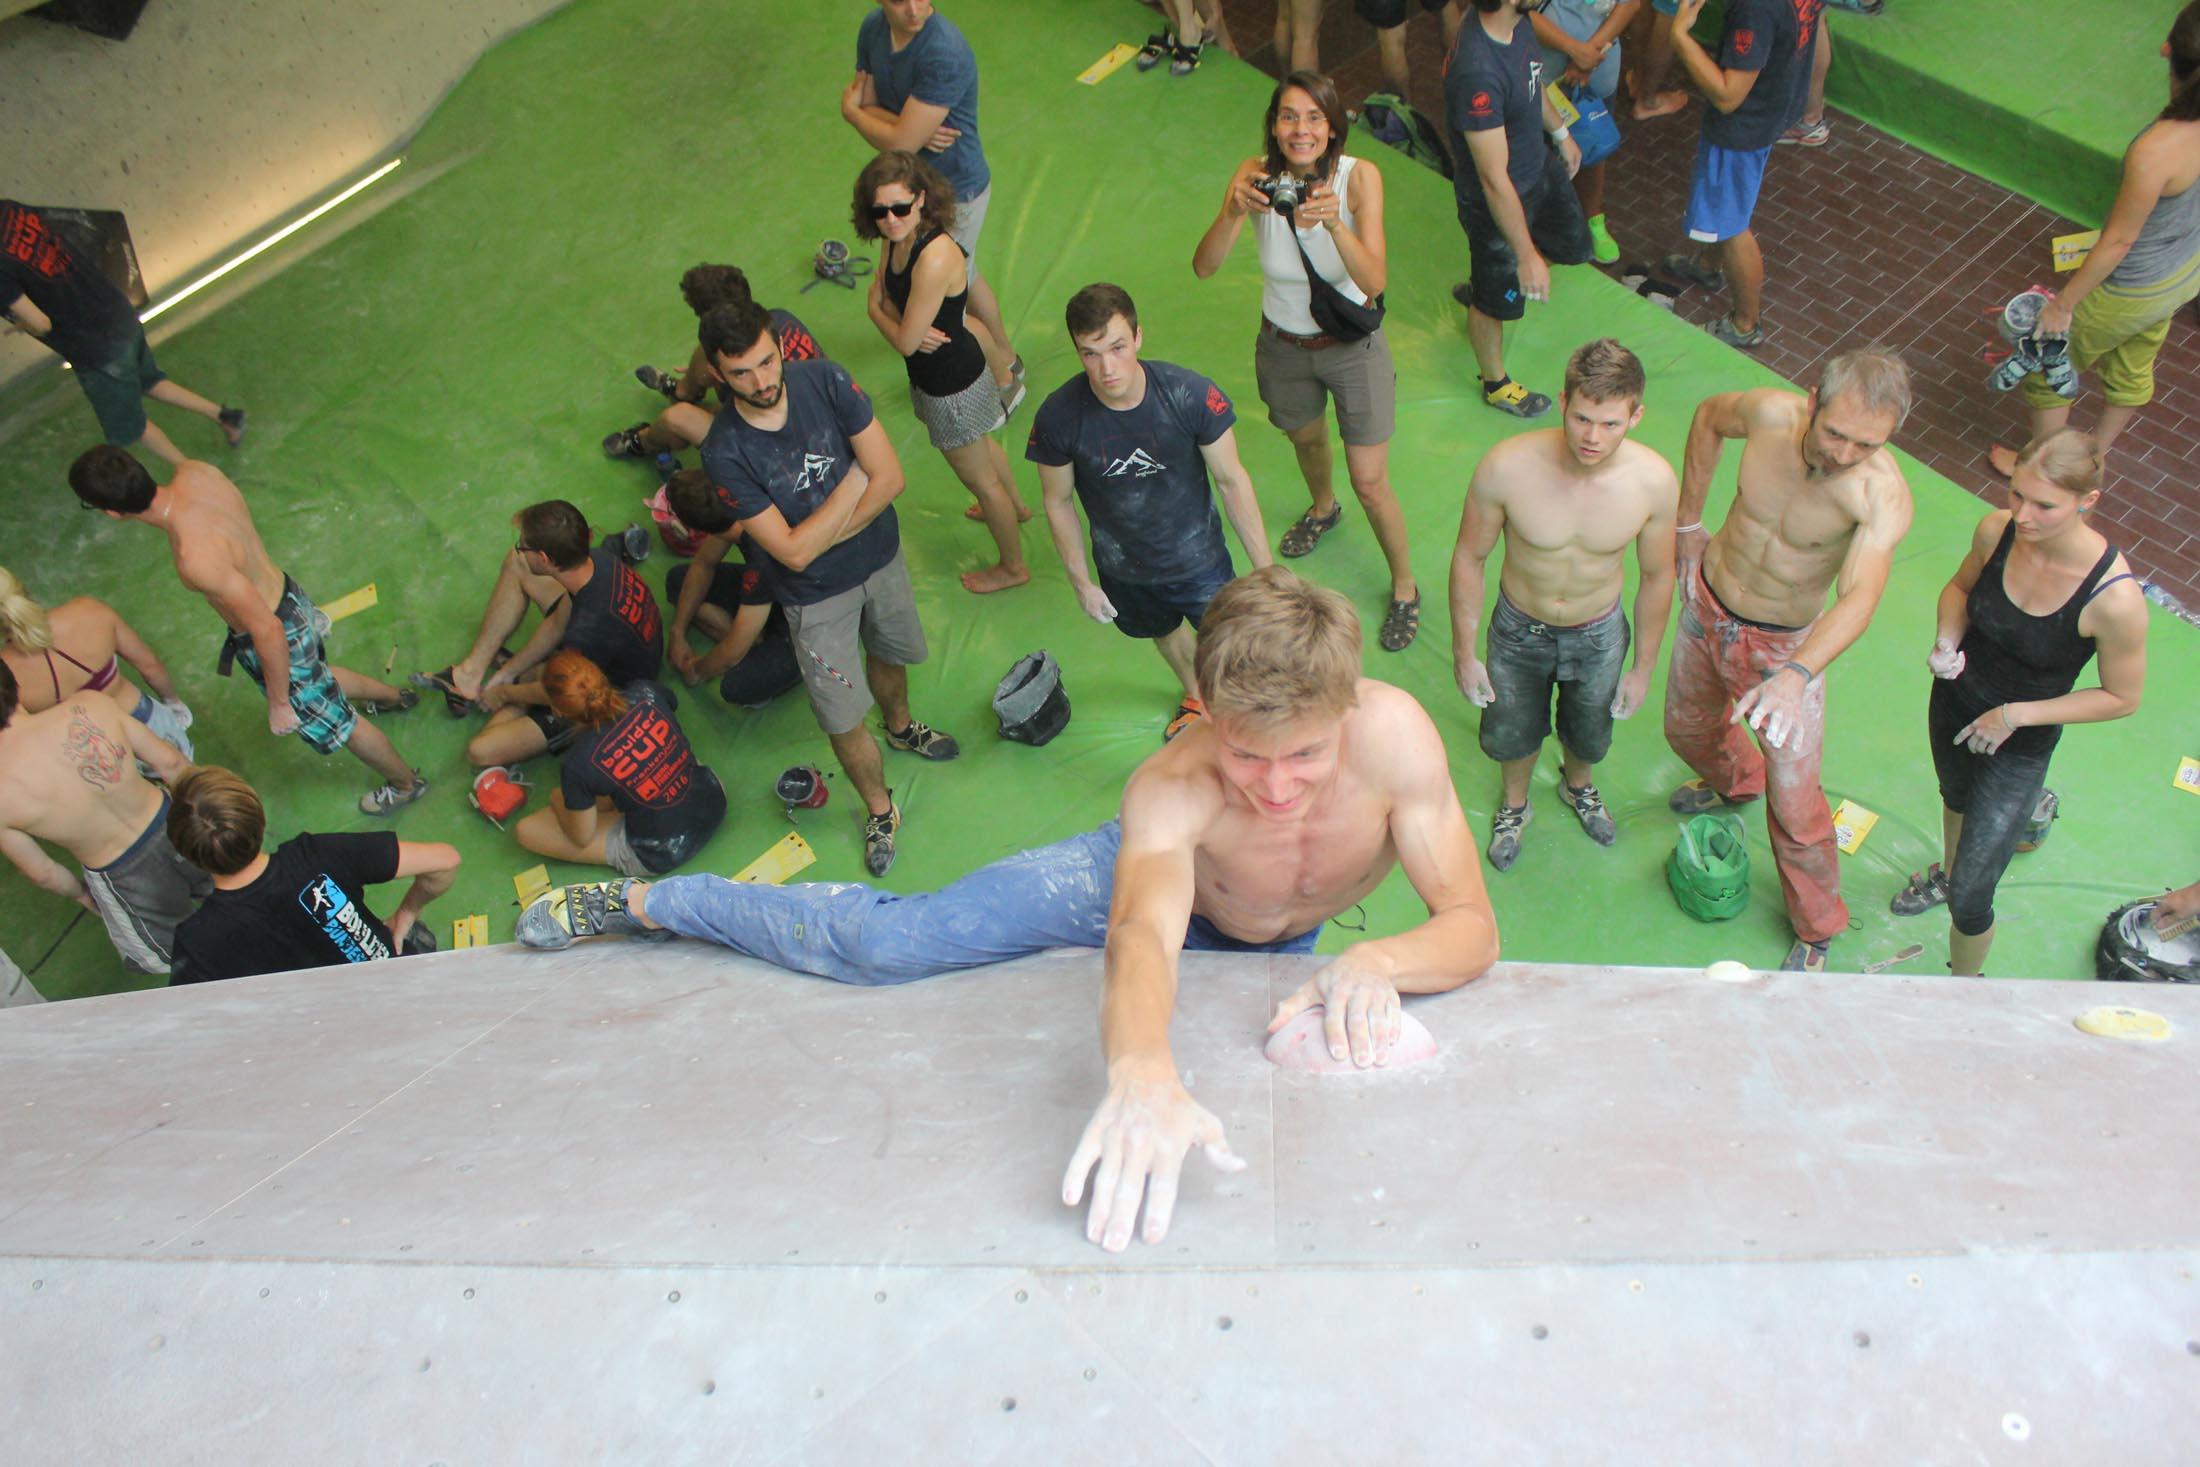 Quali, internationaler bouldercup Frankenjura 2016, BLOCKHELDEN Erlangen, Mammut, Bergfreunde.de, Boulderwettkampf07092016304